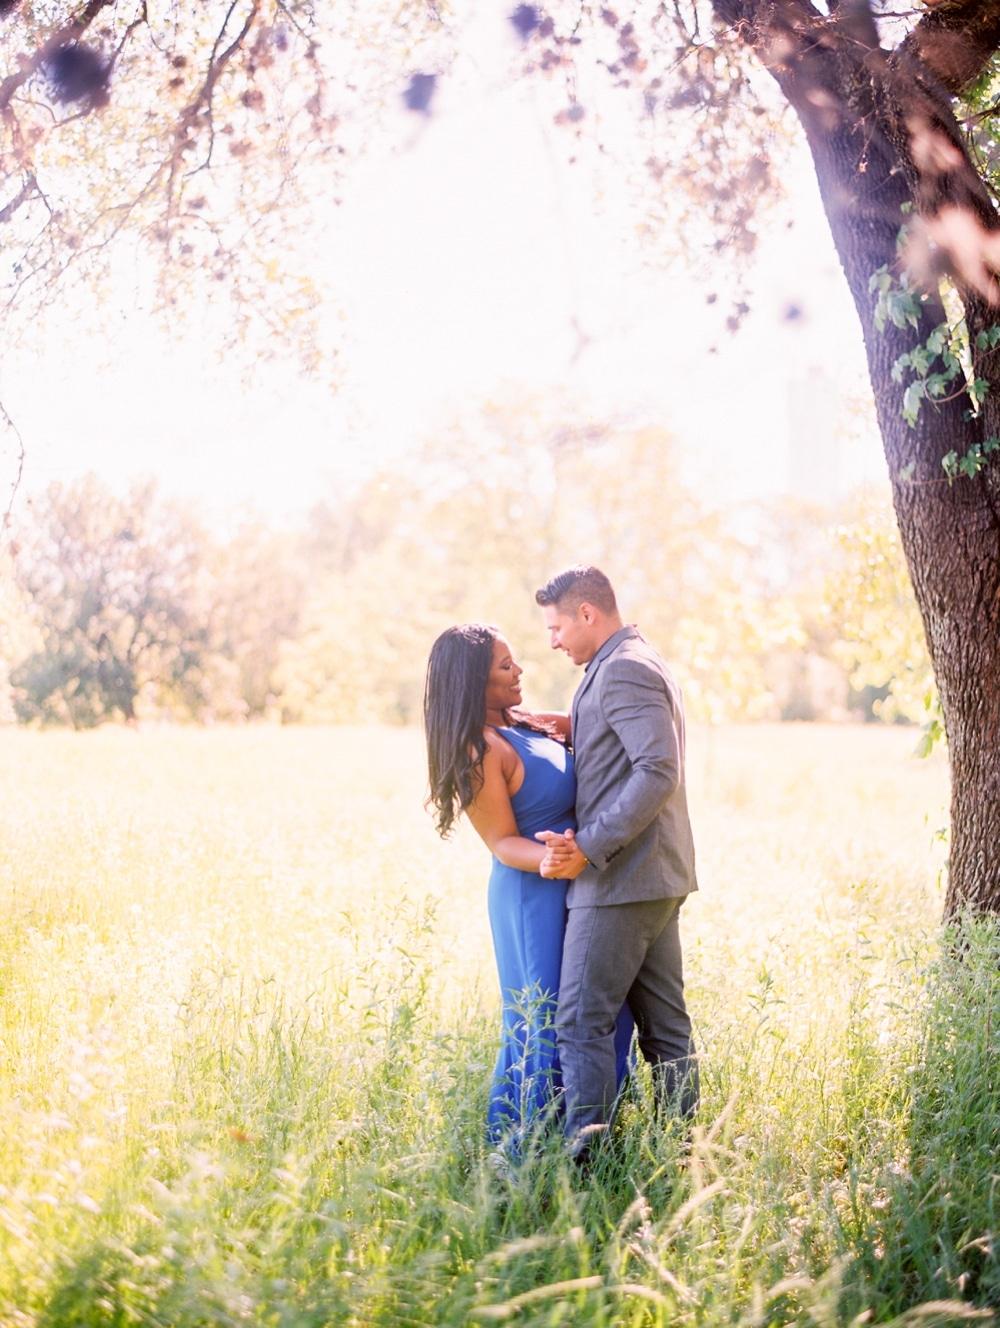 kristin-la-voie-photography-austin-wedding-photographer-52